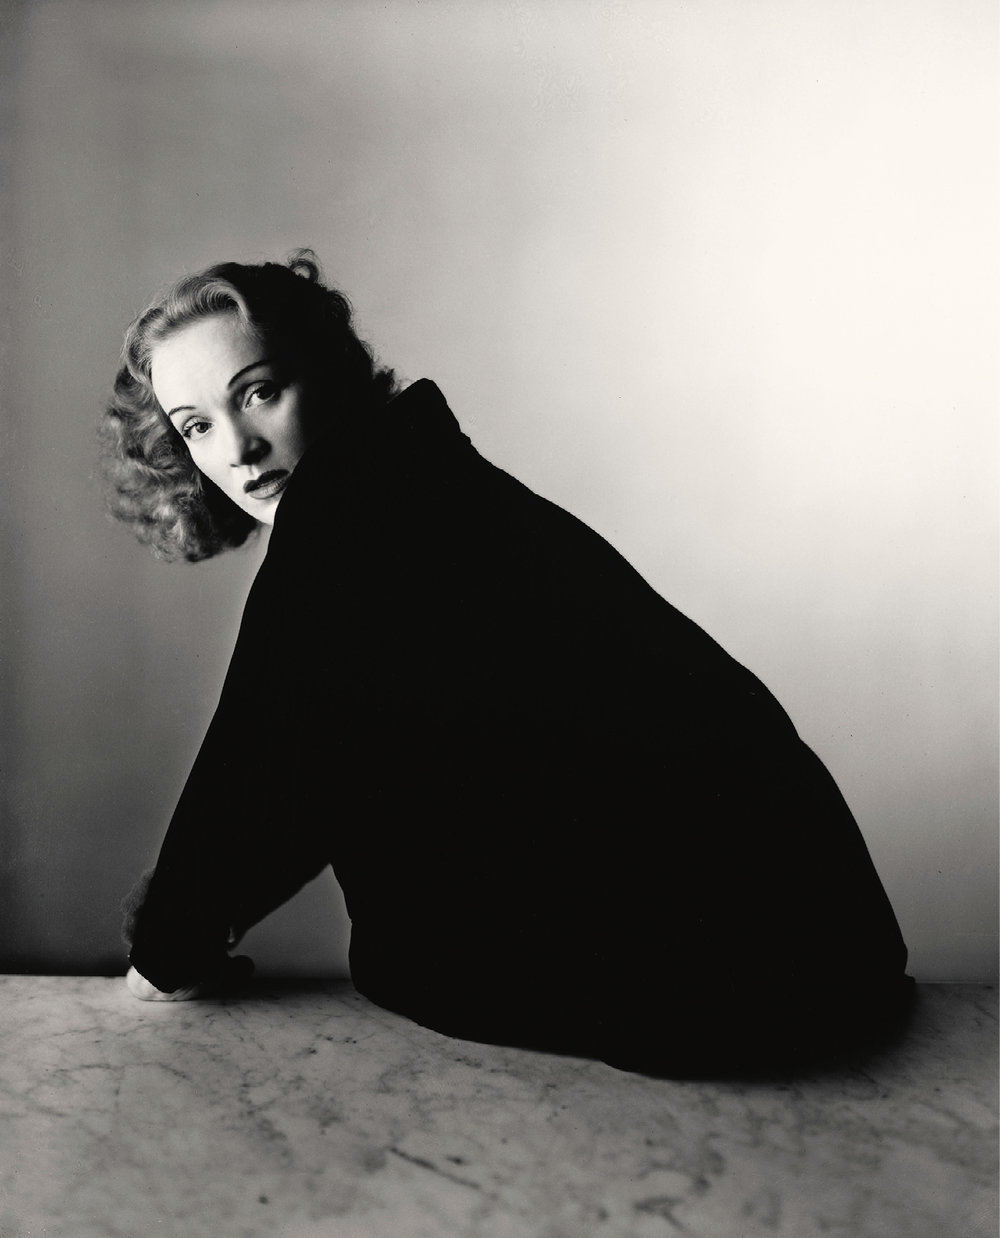 Irving Penn (American, 1917–2009) · Marlene Dietrich, New York, 1948. Gelatin silver print, 2000 · 10 × 8 1/8 in. (25.4 × 20.6 cm).  The Metropolitan Museum of Art, New York Promised Gift of The Irving Penn Foundation © The Irving Penn Foundation.